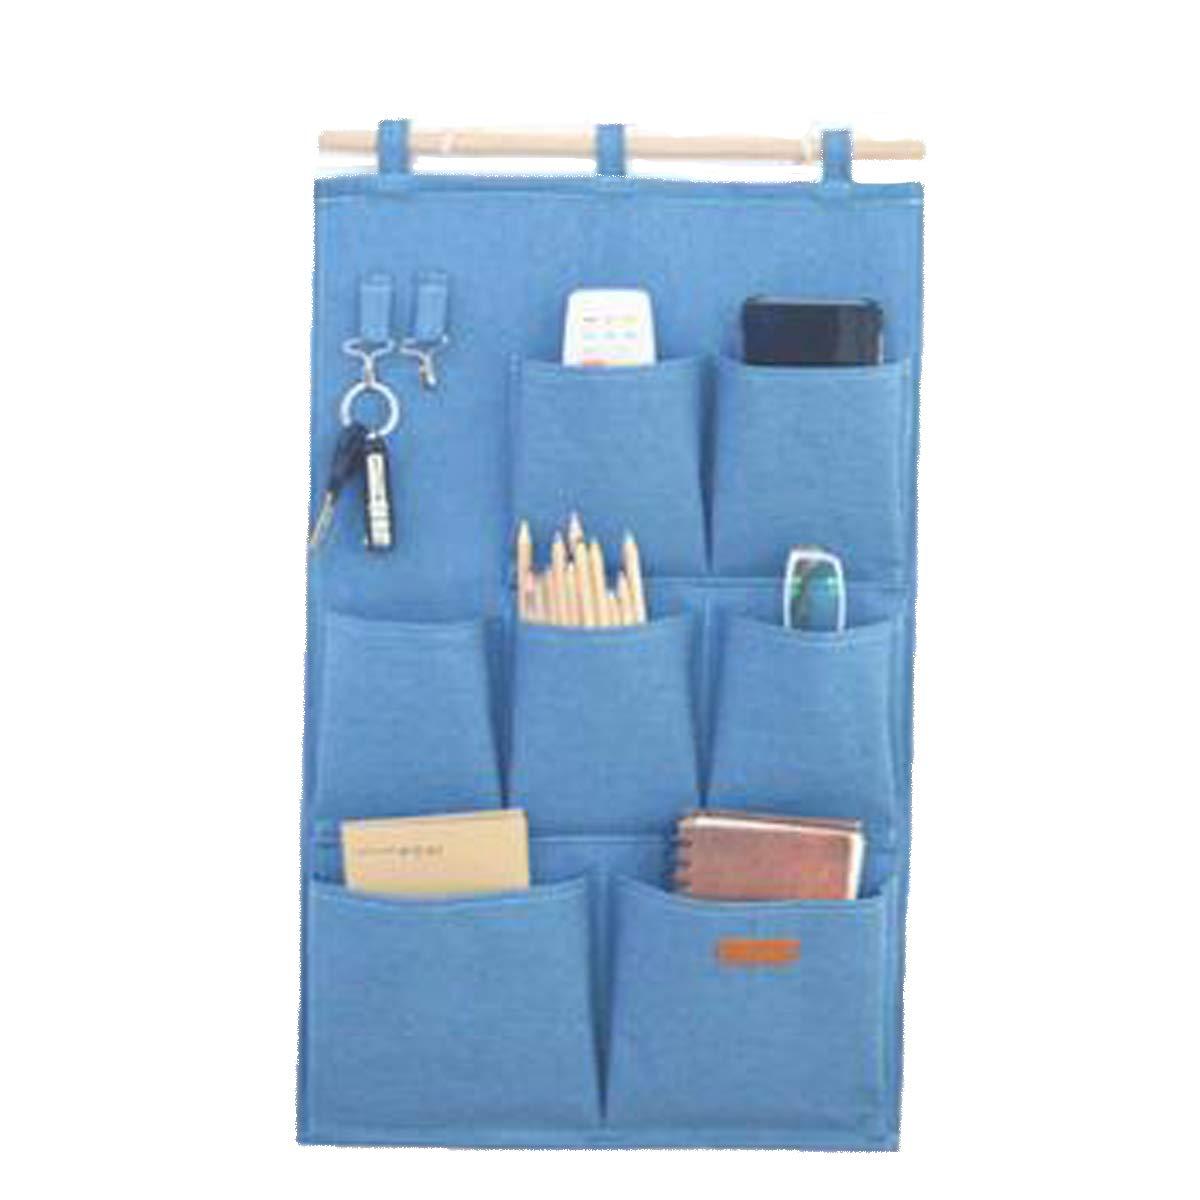 SMART HOME CHEF Denim Fabric Over Wall Door Closet Window Hanging Storage Case Organizer Bag 7-Pocket Wall Hanging Multipurpose Accessory Organizer with 2 Hooks